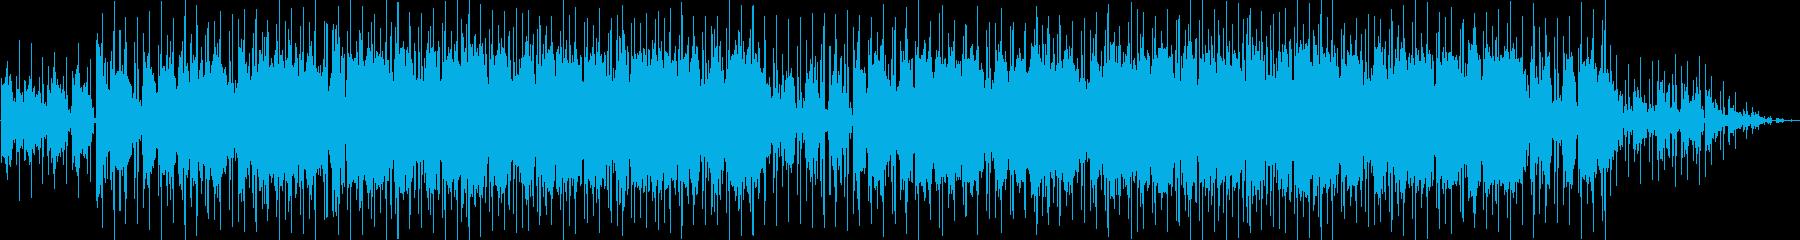 LoFi系切ないチルアウトの再生済みの波形